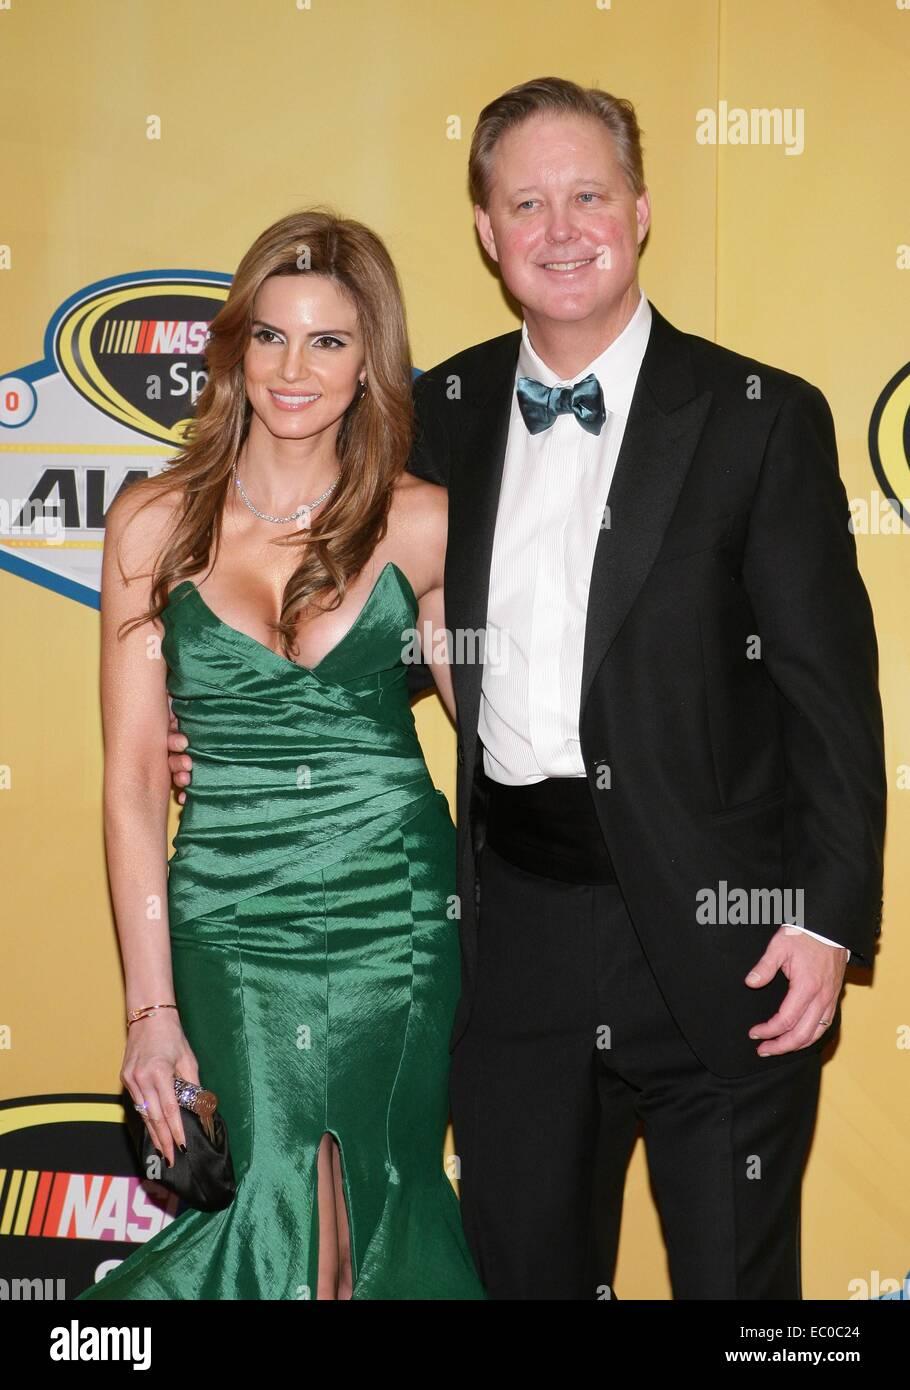 Wedding Dress Amy France NASCAR